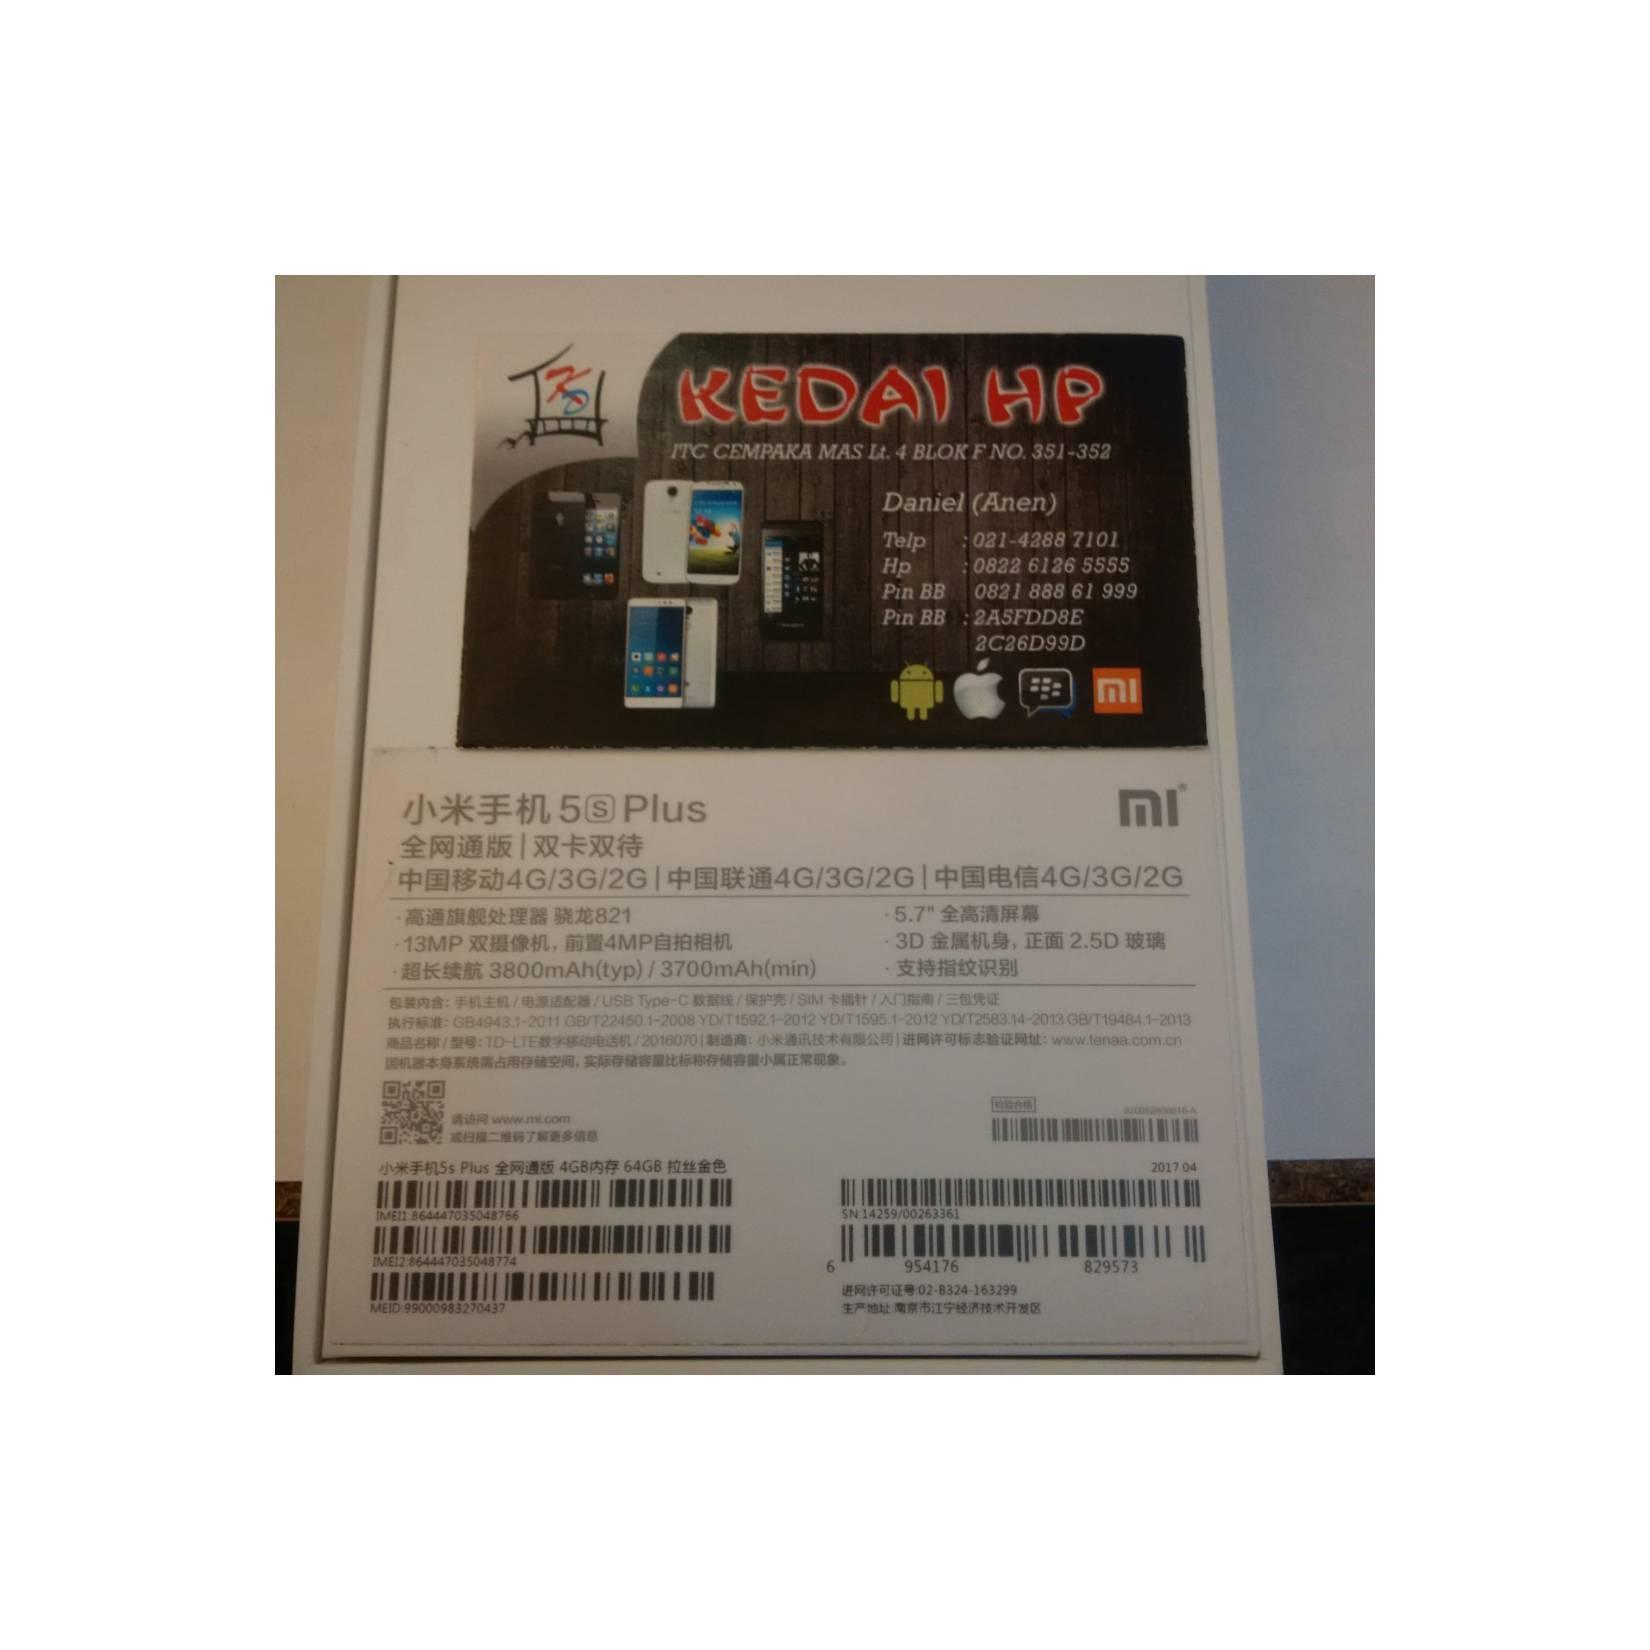 HP XIAOMI MI5S PLUS 4 64 GOLD GARANSI DISTRIBUTOR 1 TAHUN ANDROID XIO  - 27f3002b194d0b2f4dc1c7578ee888f5 - Update Harga Terbaru Hp Xiaomi Mi5 Gsmarena Agustus 2018